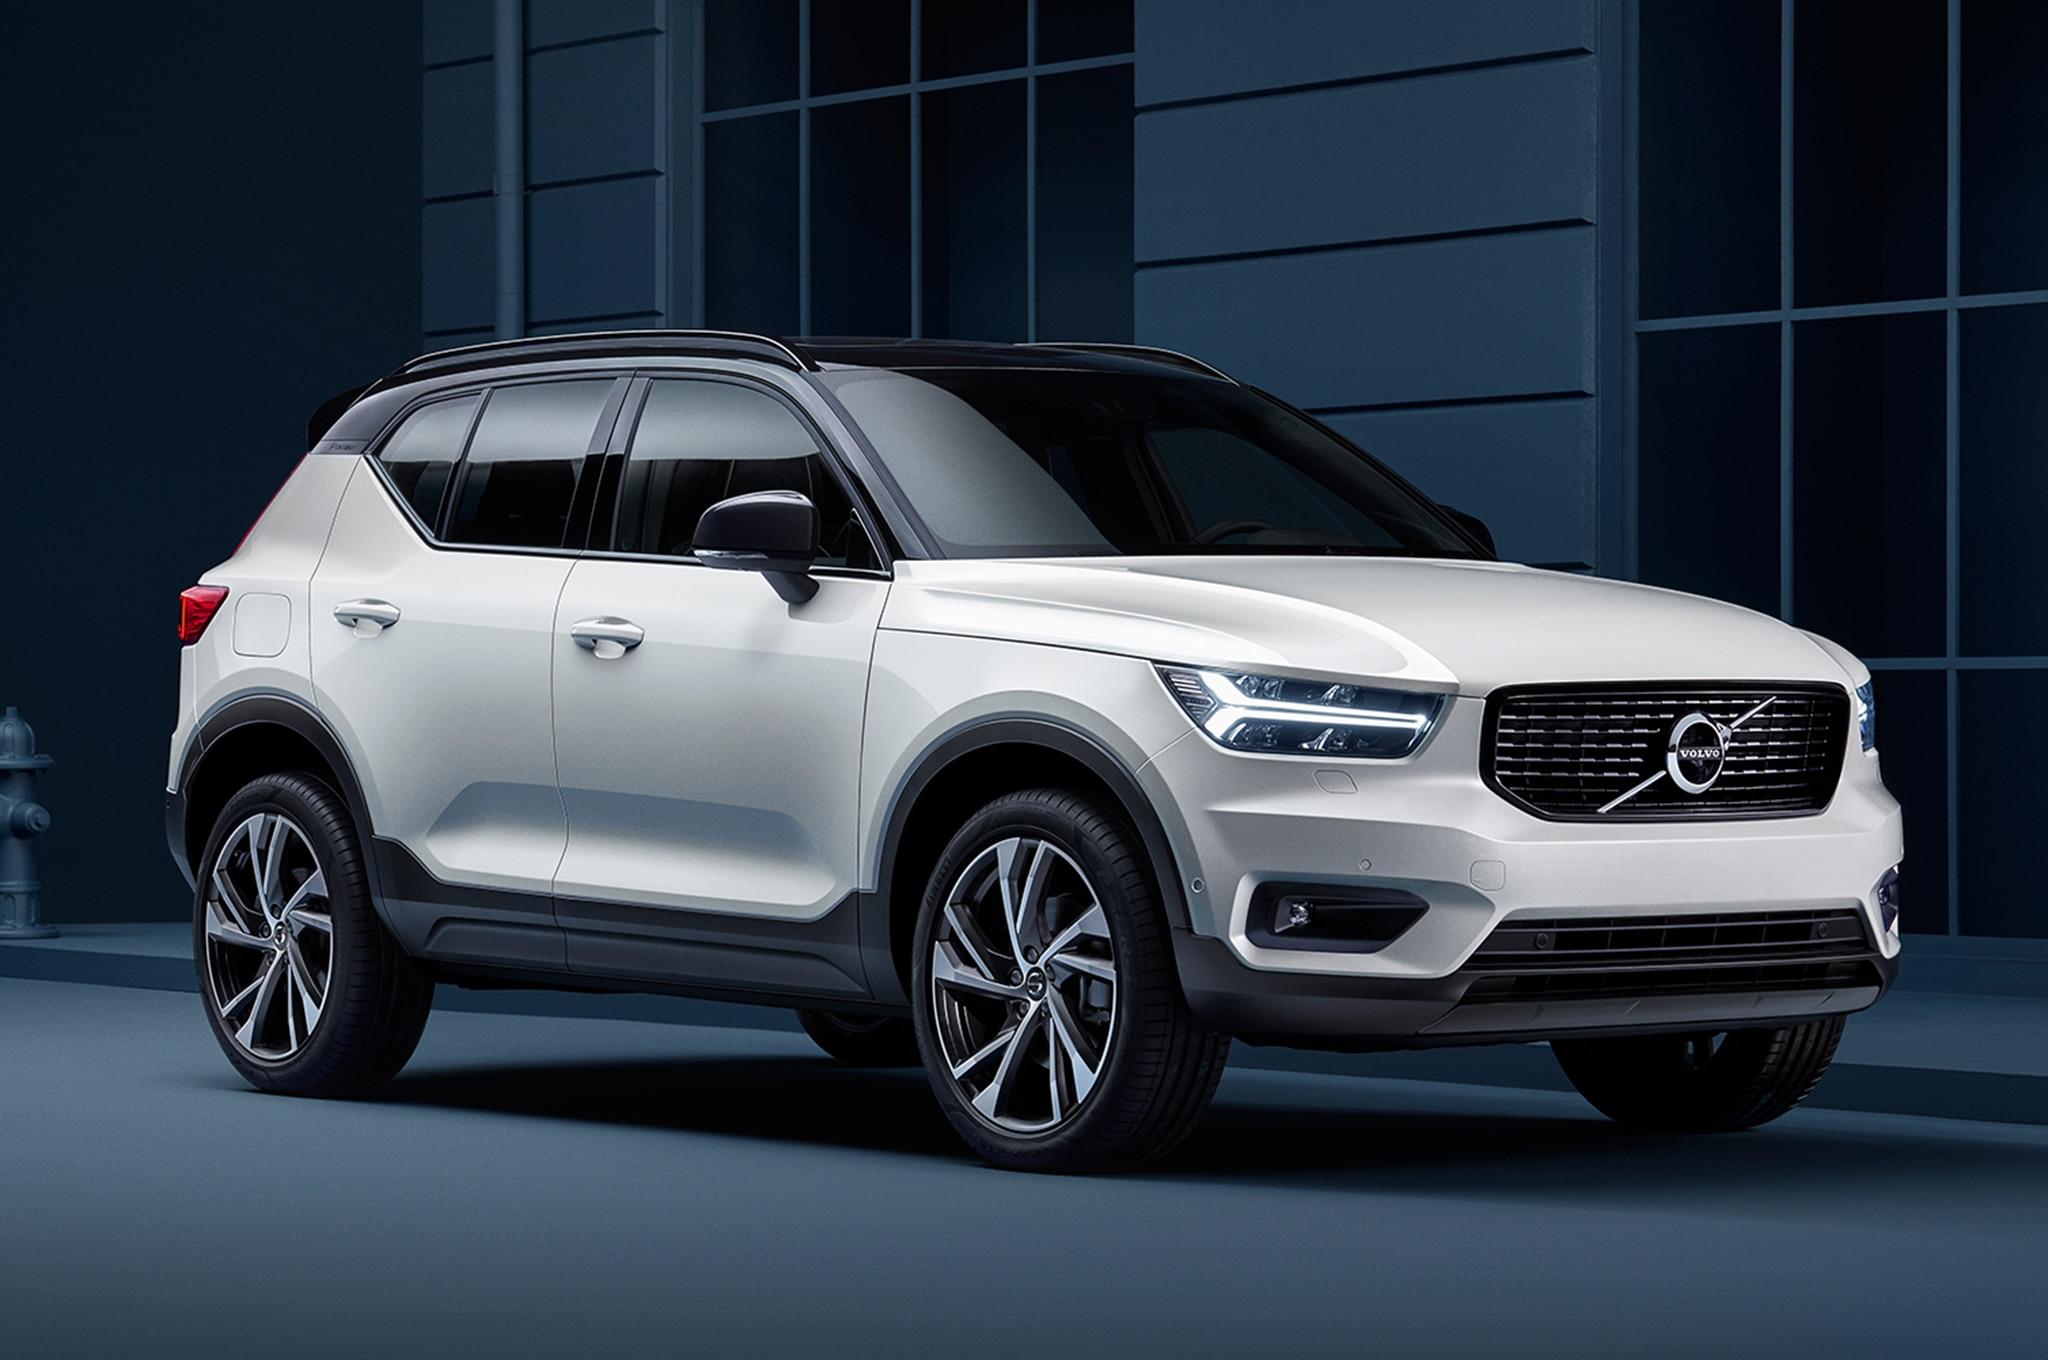 2018 Volvo XC40 Front Three Quarter 00